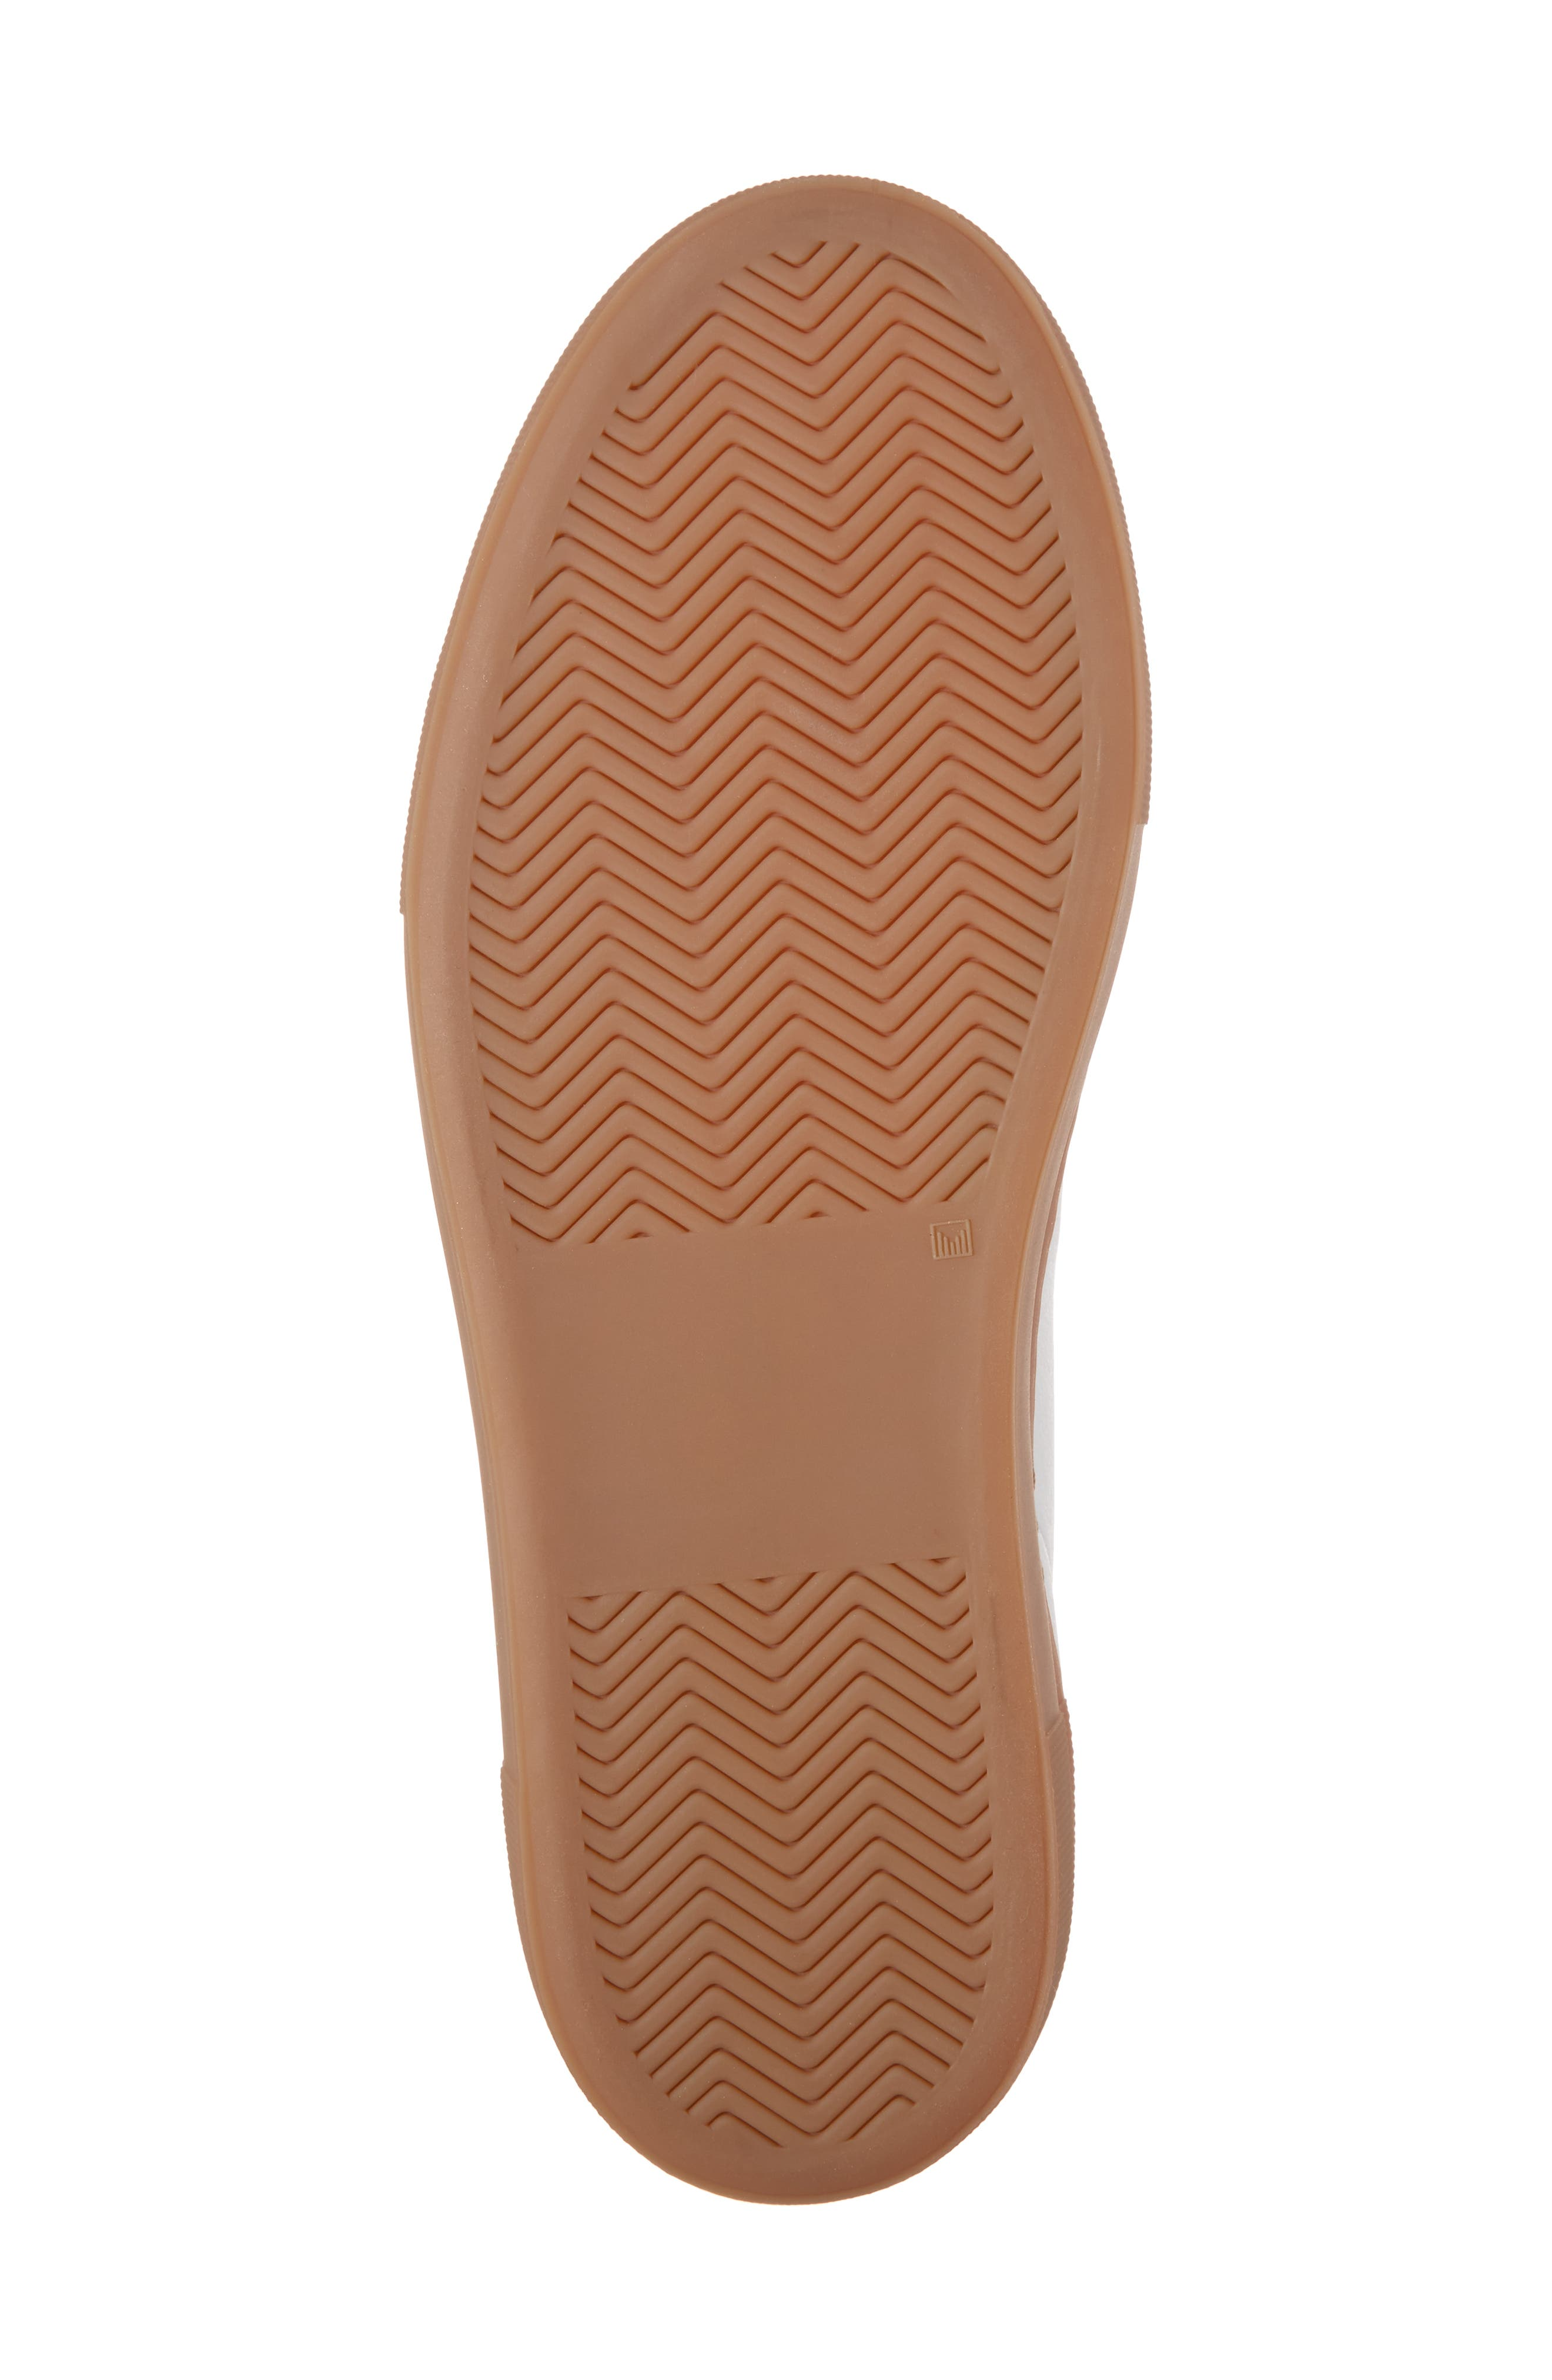 Clean 360 Fuzzy Heel Sneaker,                             Alternate thumbnail 6, color,                             White